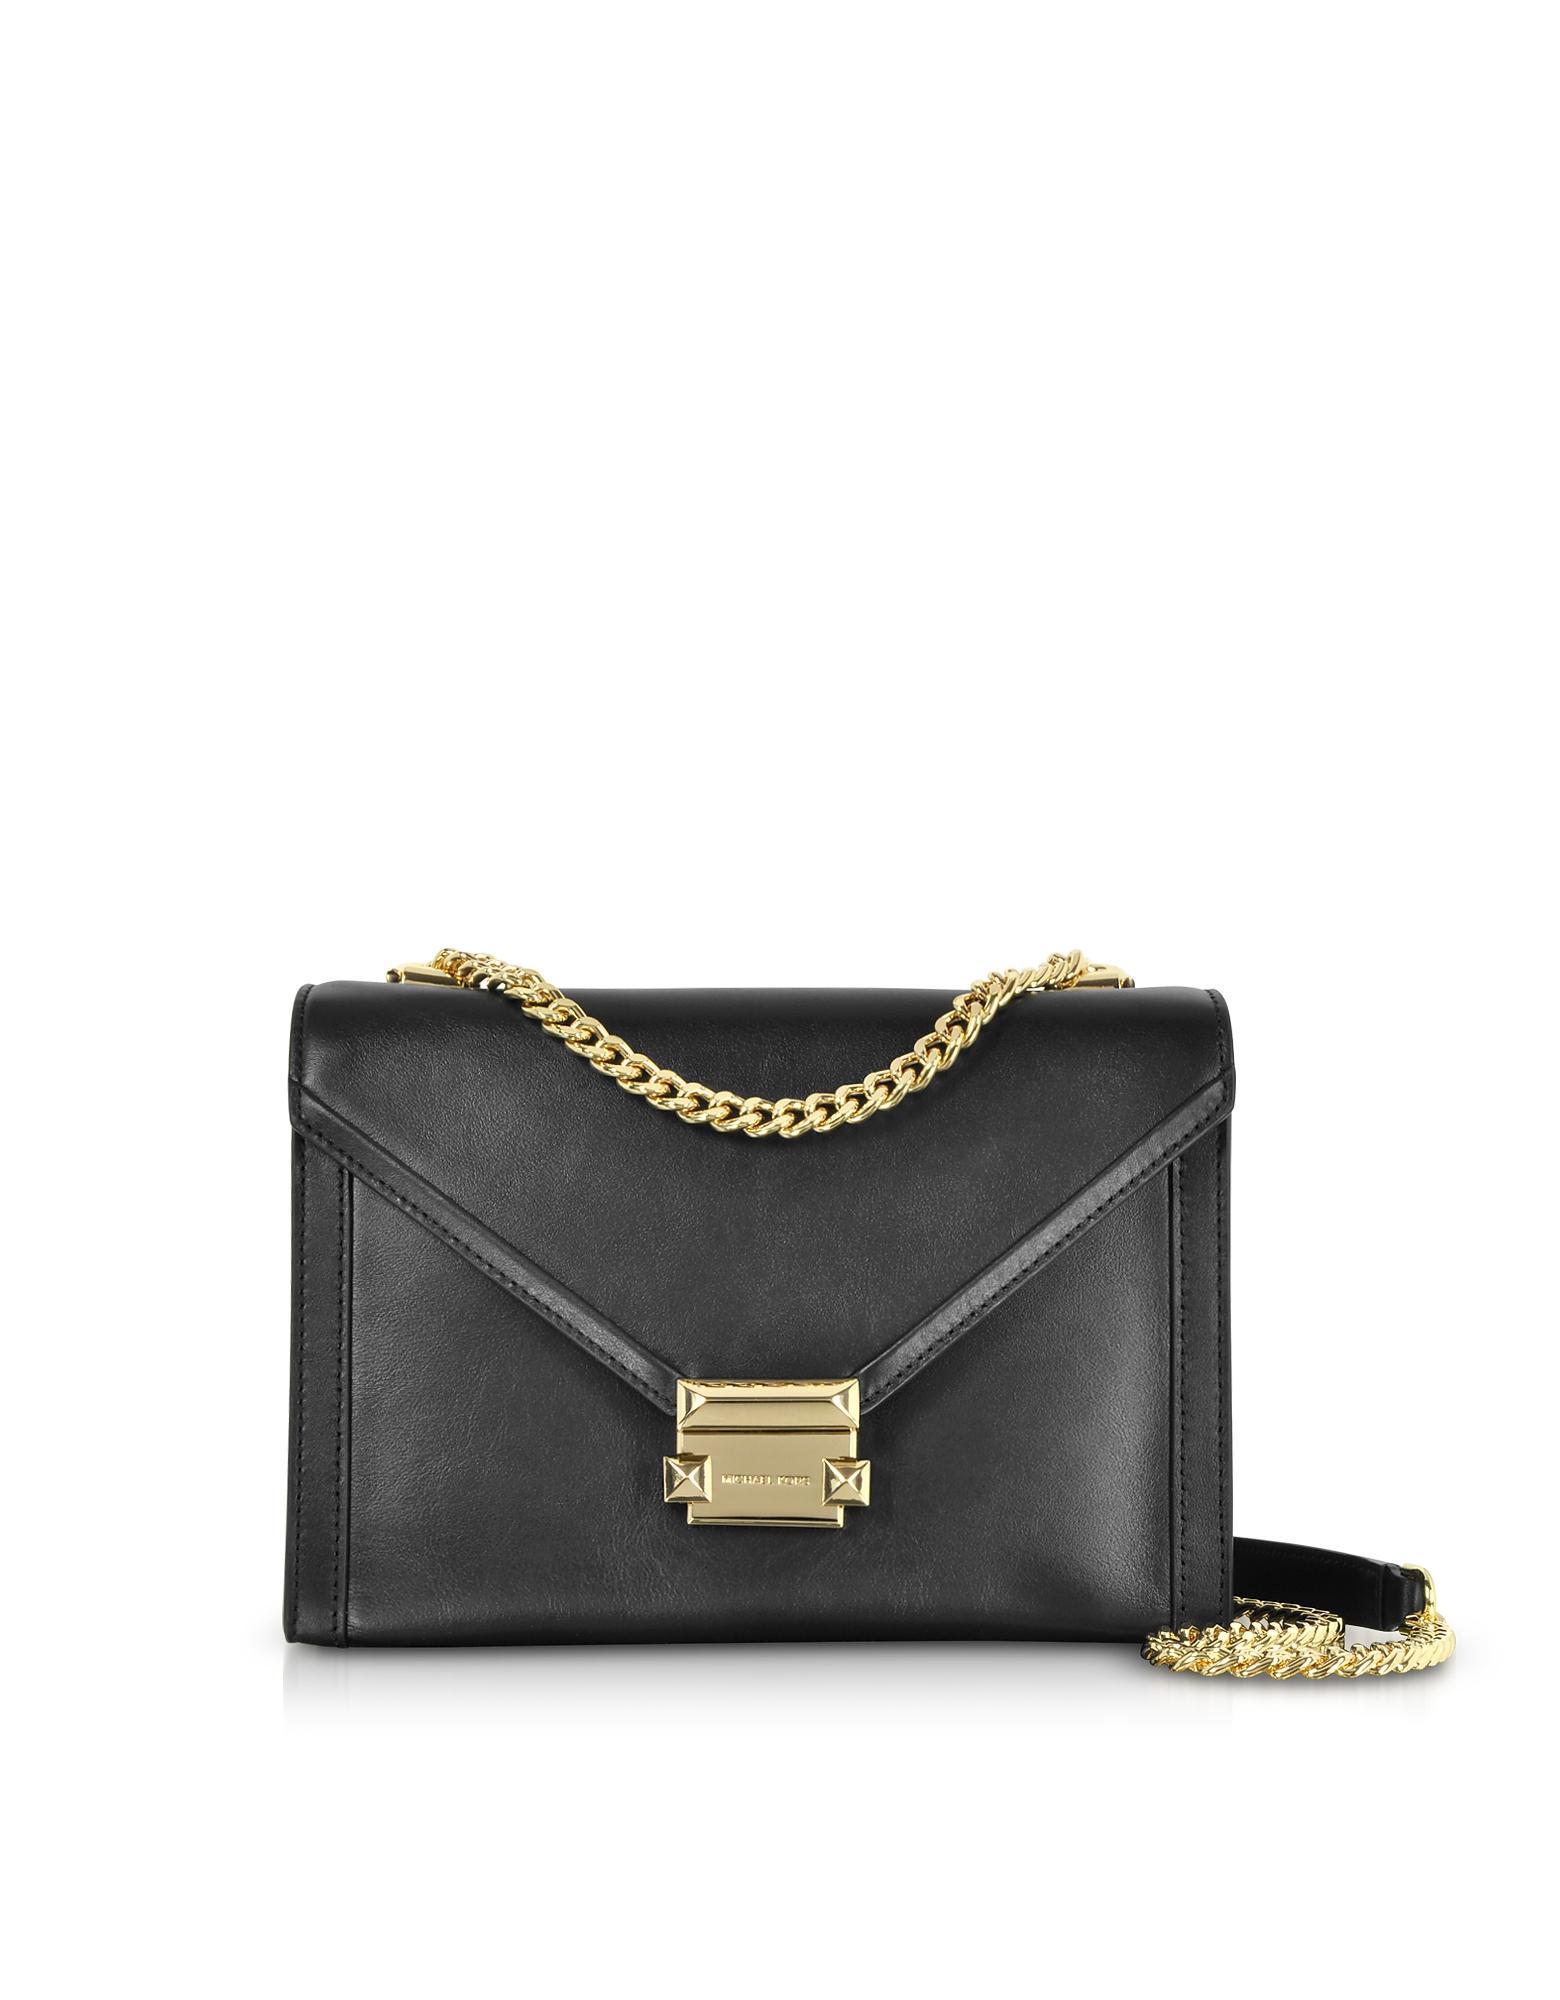 79f21dc5dbe7 Michael Kors. Women's Black Whitney Large Leather Convertible Shoulder Bag